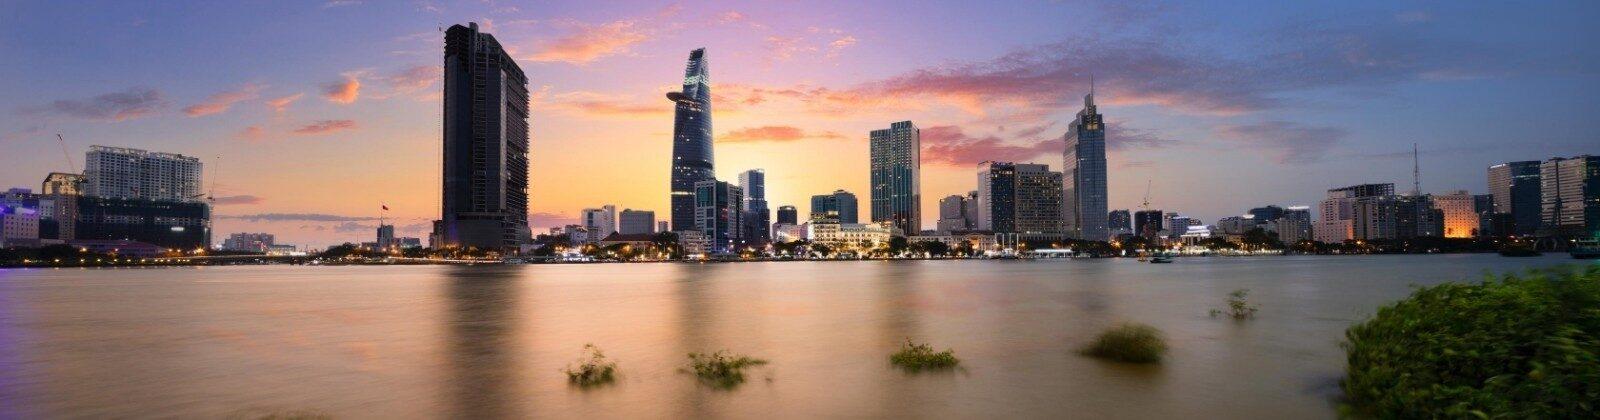 ho chi minh city mekong vietnam